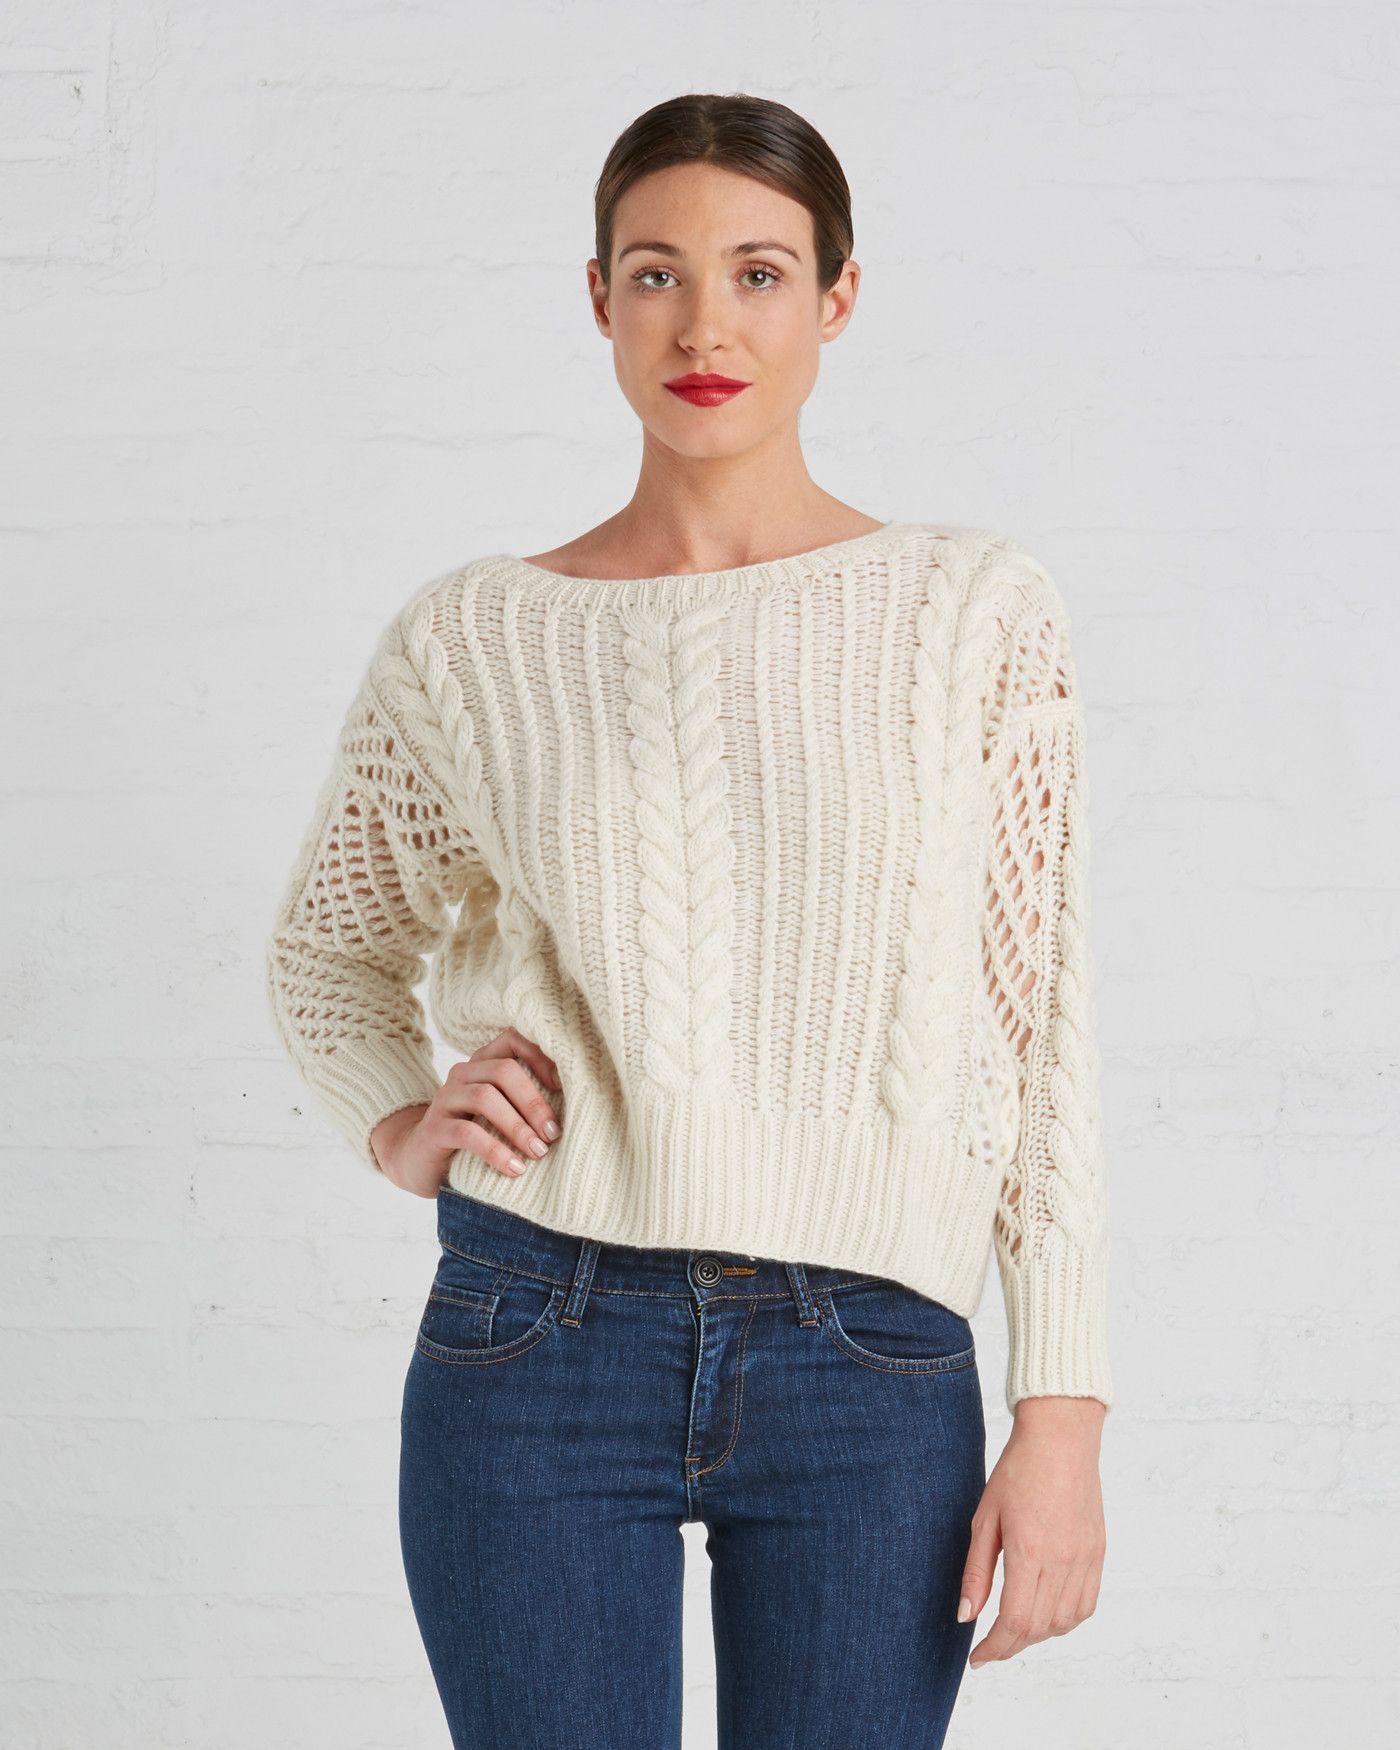 Ryan Roche Cashmere Fisherman Crop Sweater | Ivory